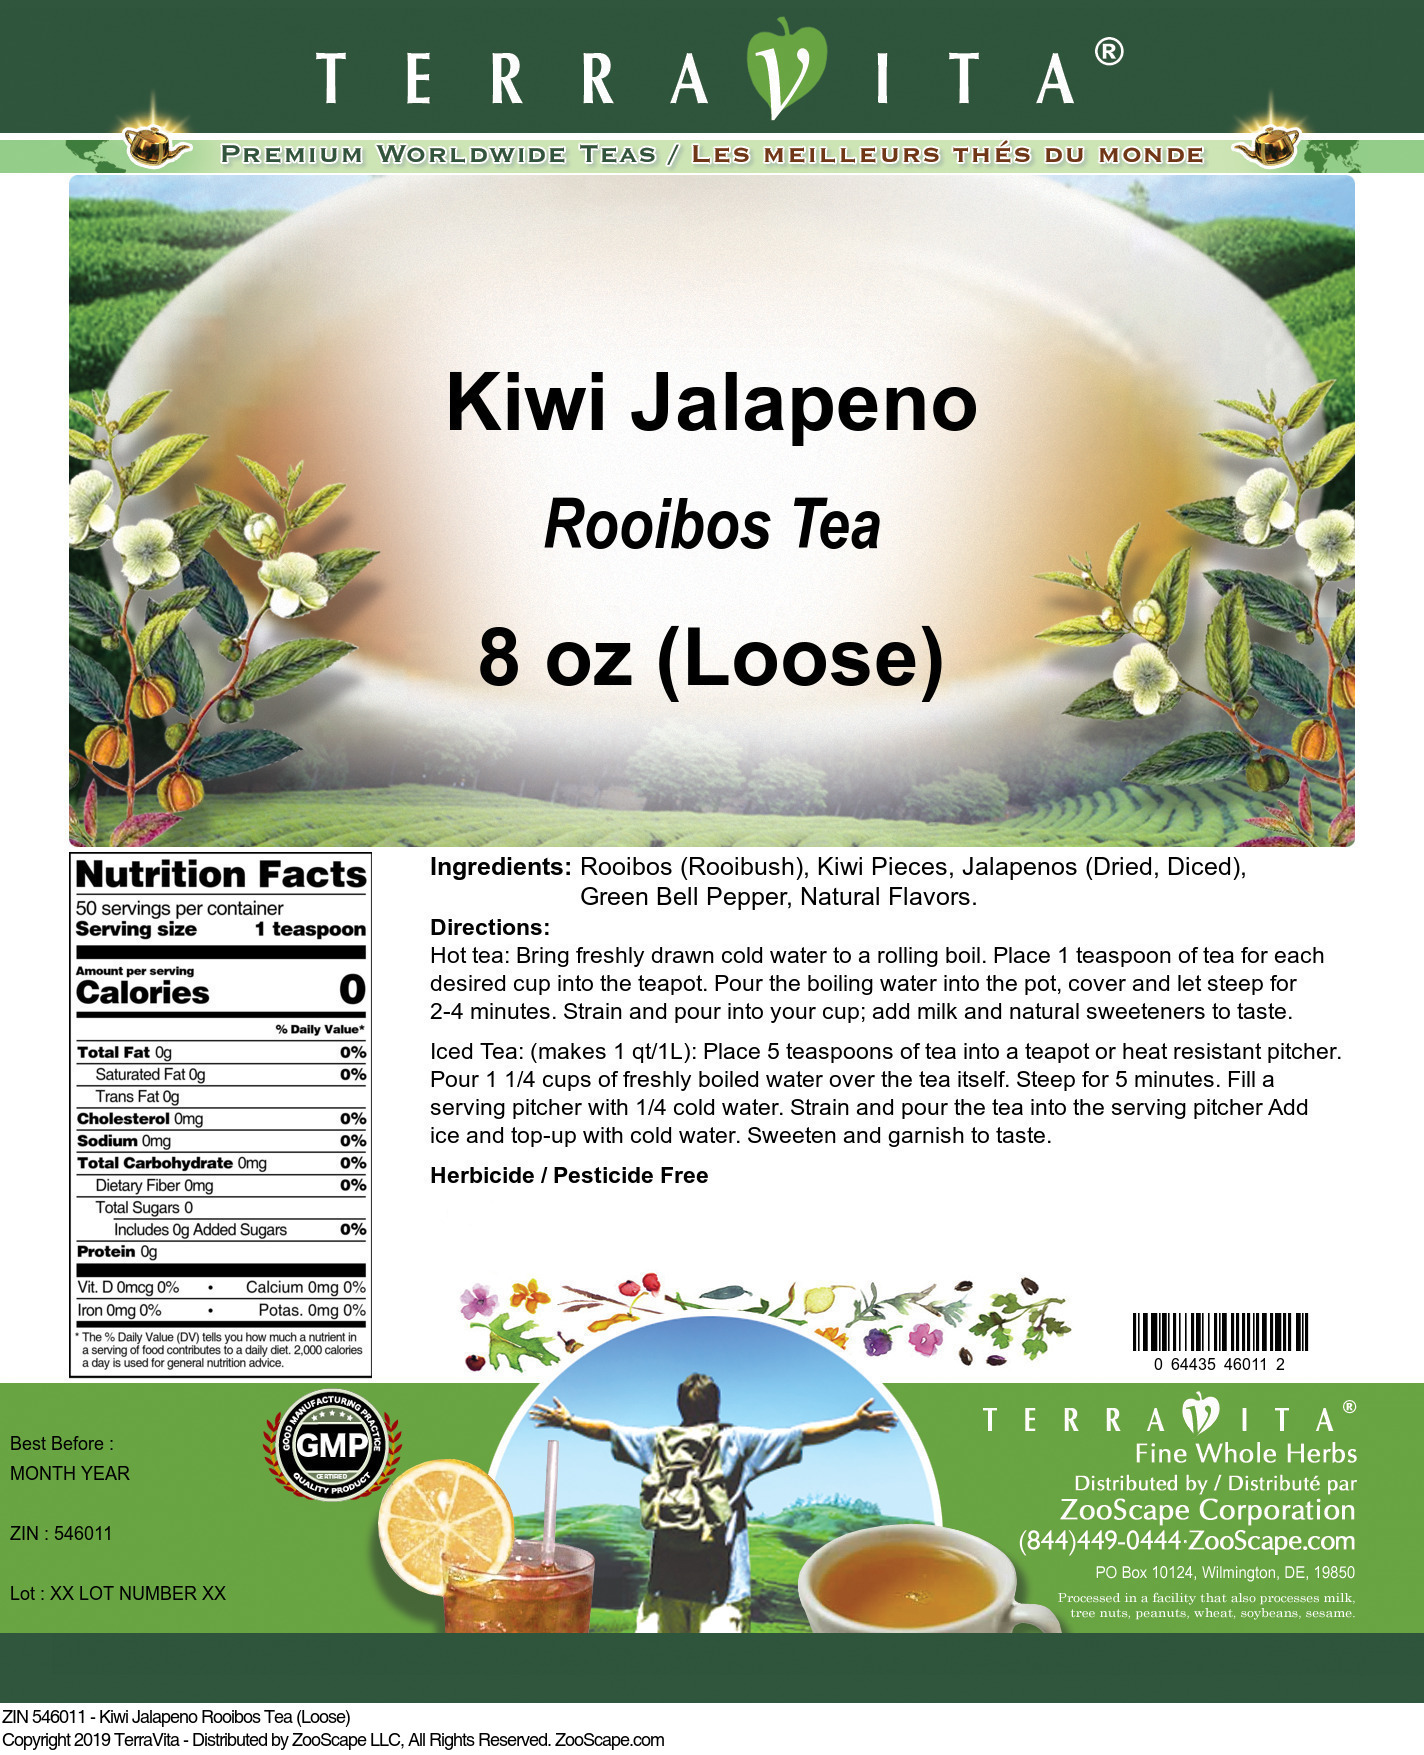 Kiwi Jalapeno Rooibos Tea (Loose)